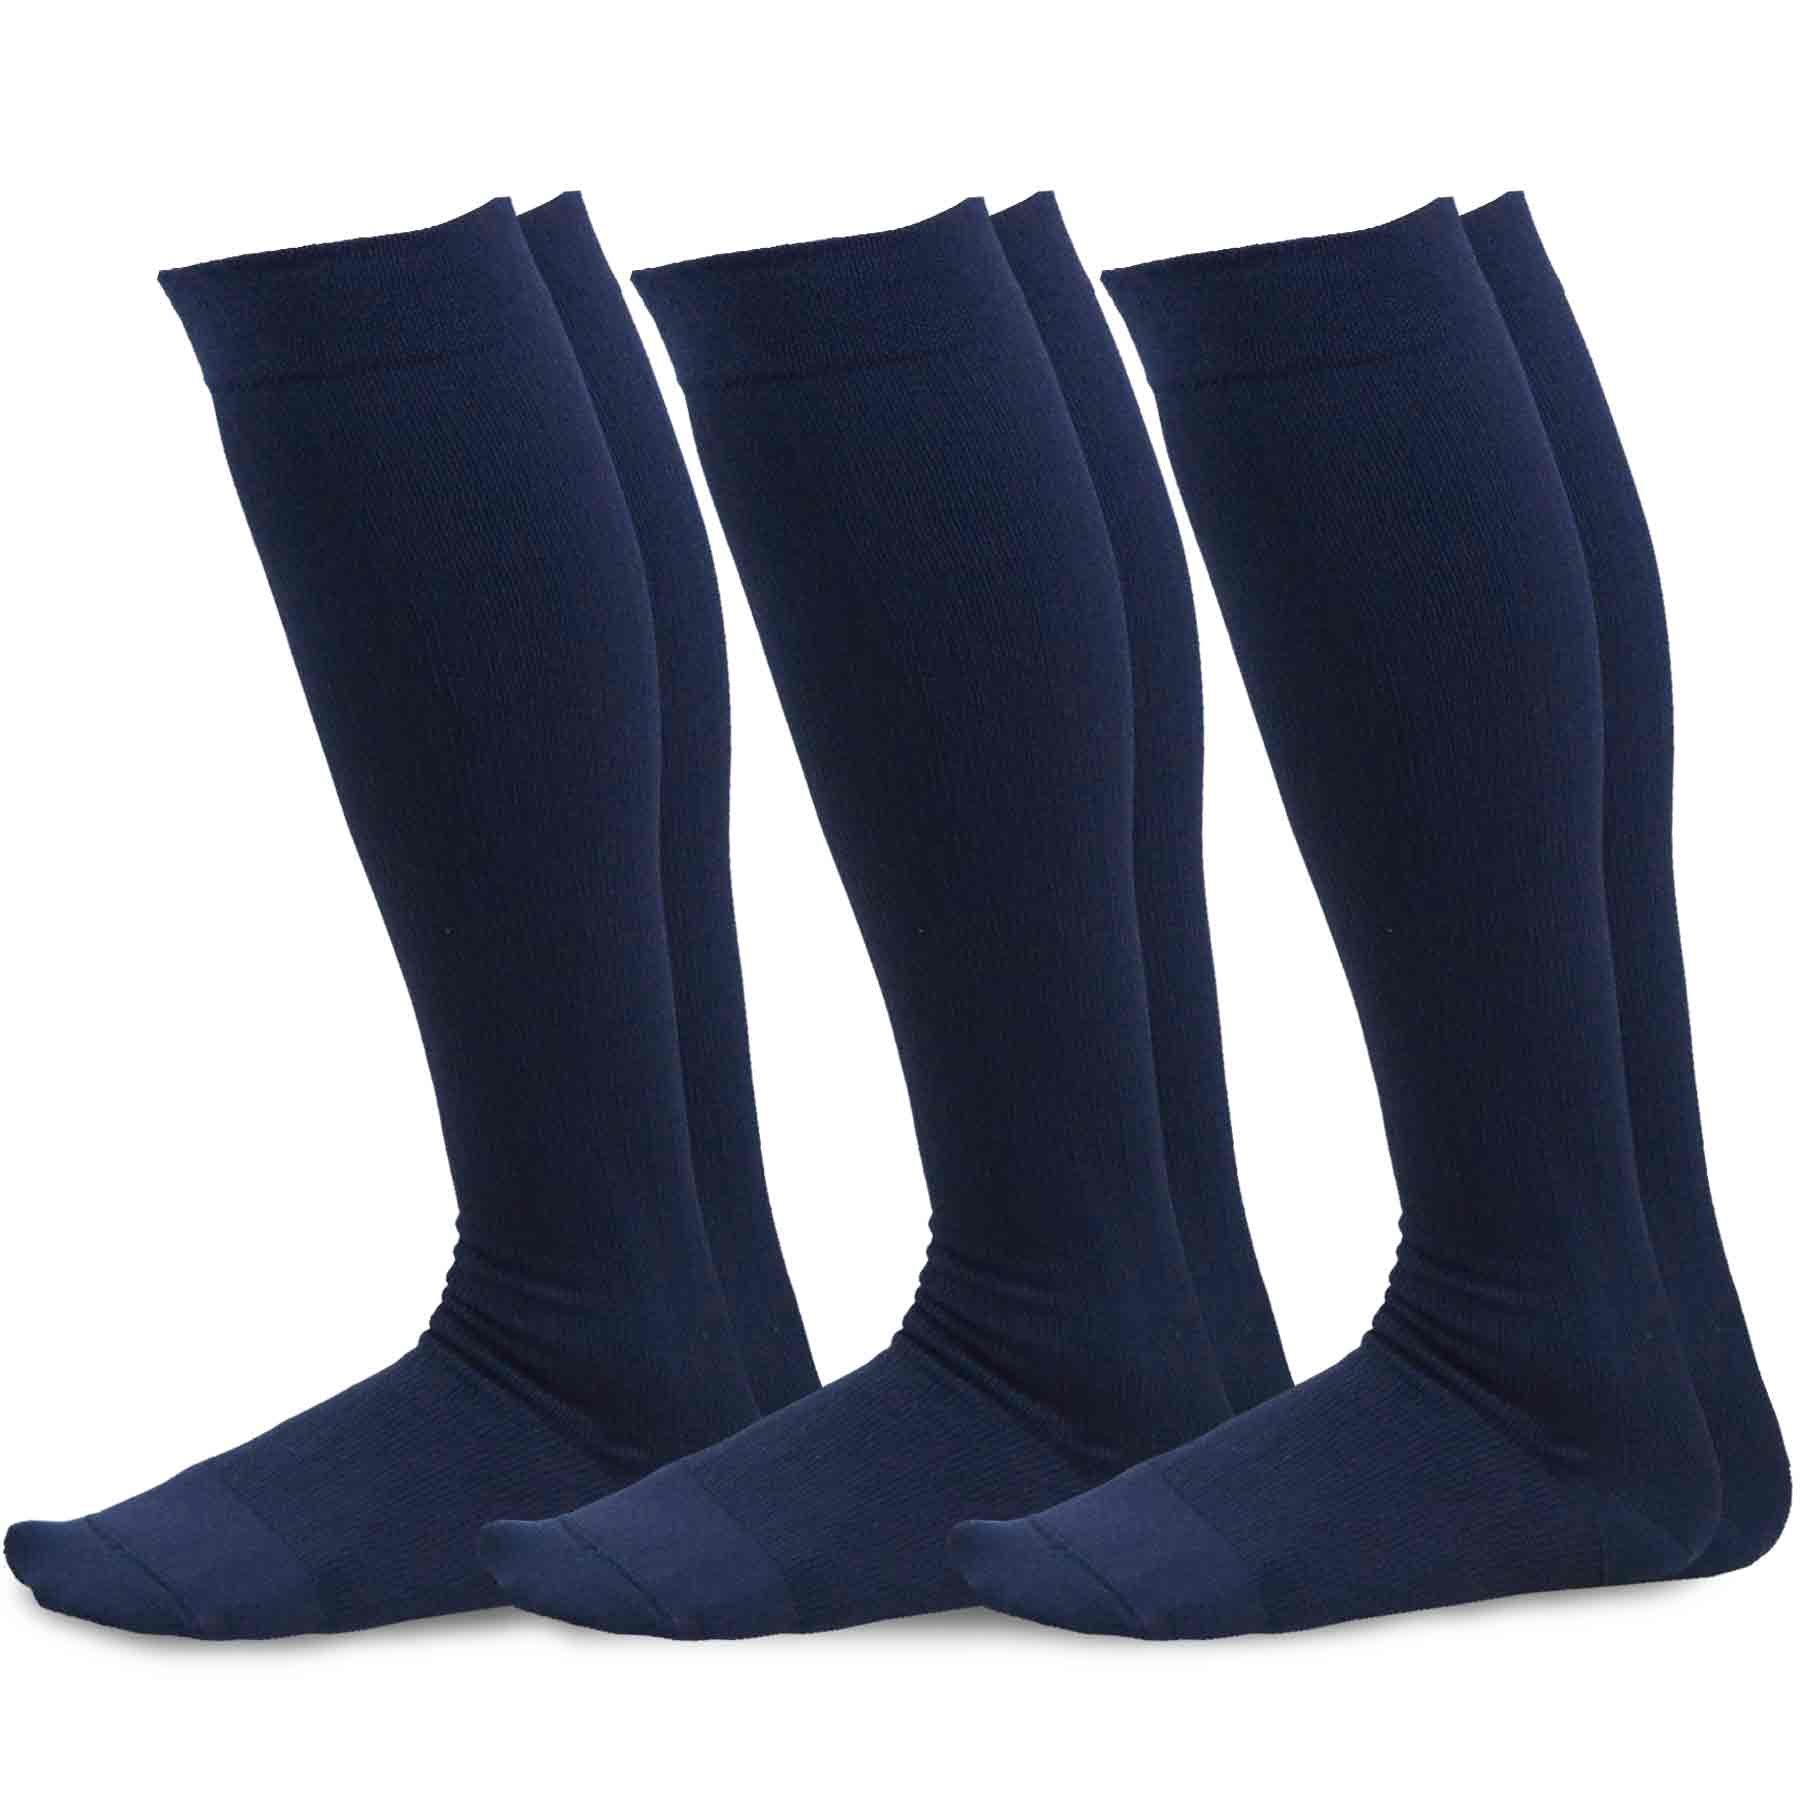 TeeHee Microfiber Compression Knee High Socks with Rib 3-Pack (Small (8-9), Navy)